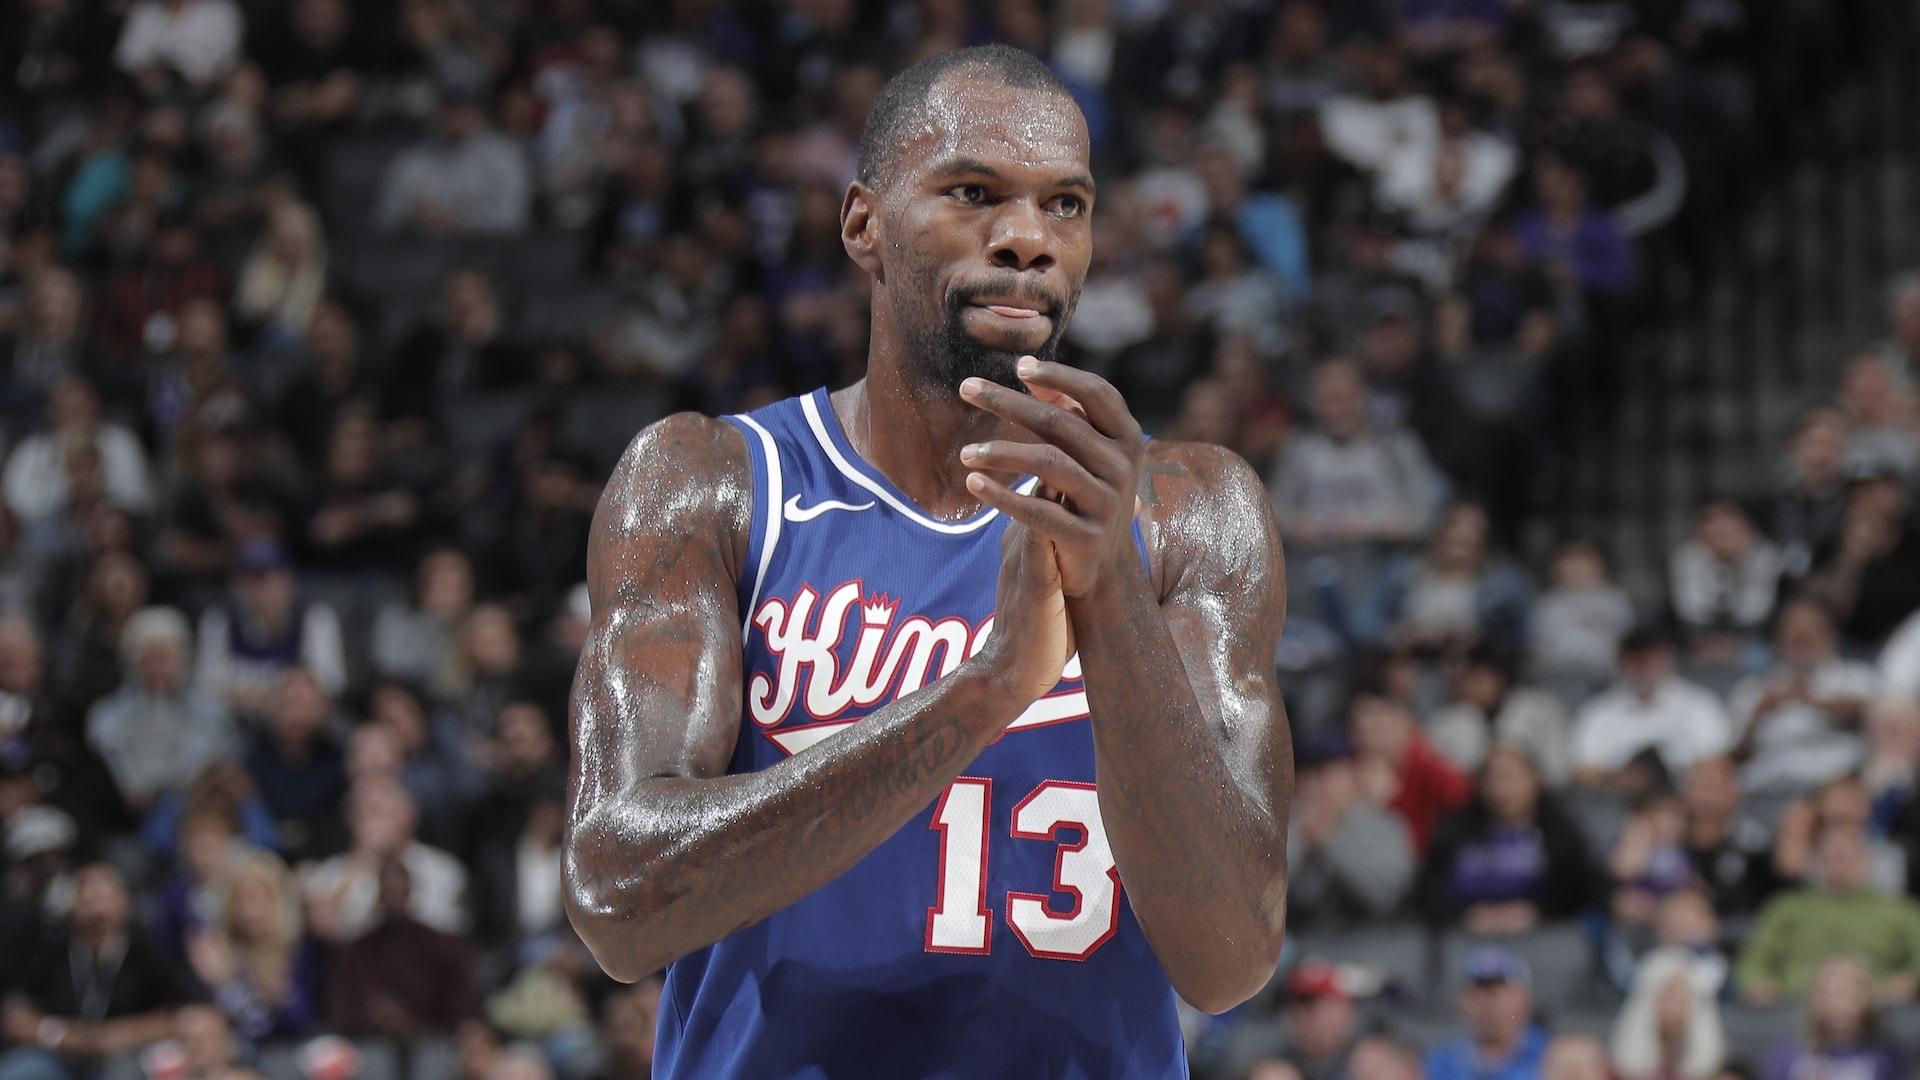 NBA fines Dewayne Dedmon for publicly asking for a trade